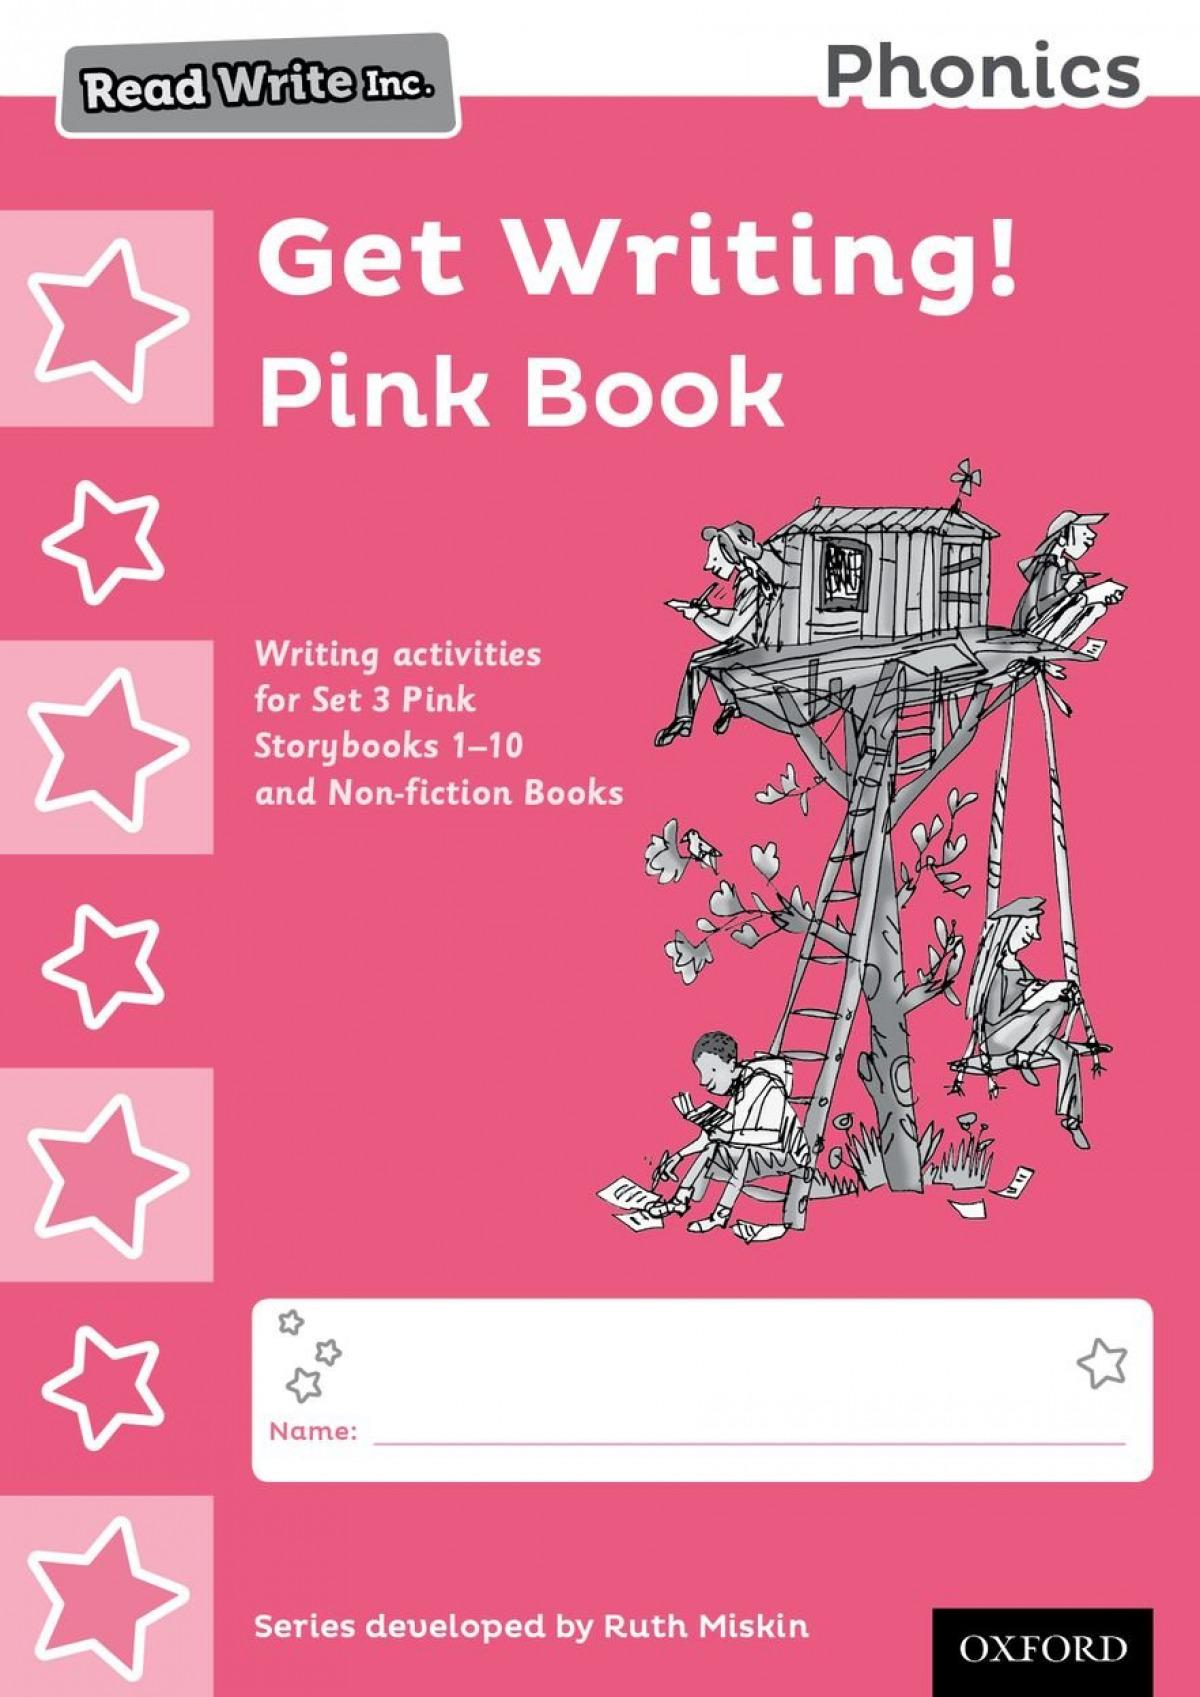 PACK 10 READ WRITE INC.PHONICS:GET WRITING PINK BOOK